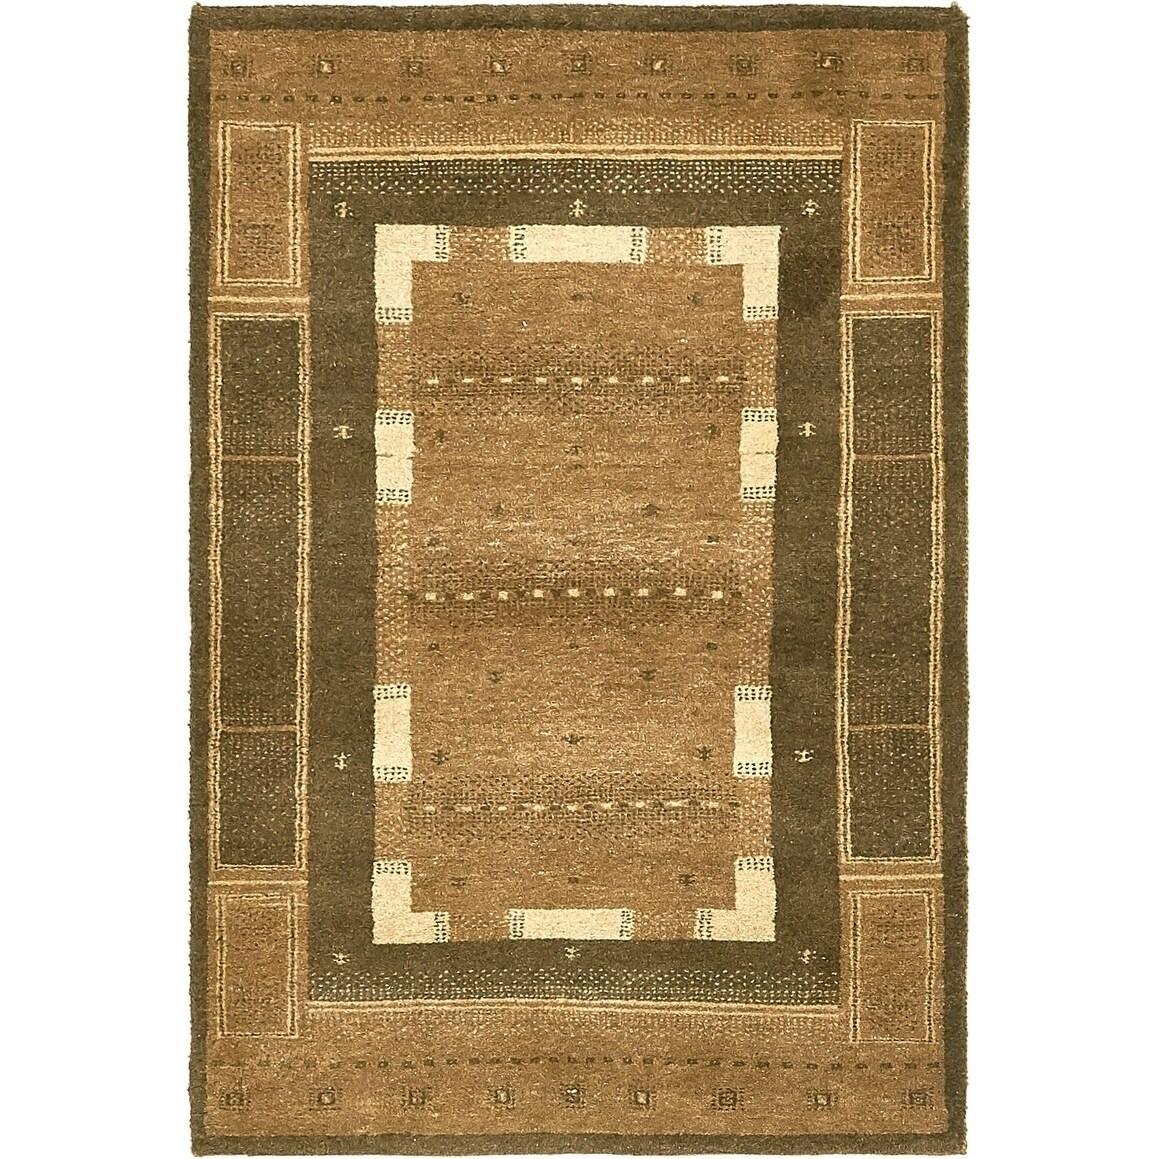 Hand Knotted Kashkuli Gabbeh Wool Area Rug - 3 2 x 4 9 (Brown - 3 2 x 4 9)